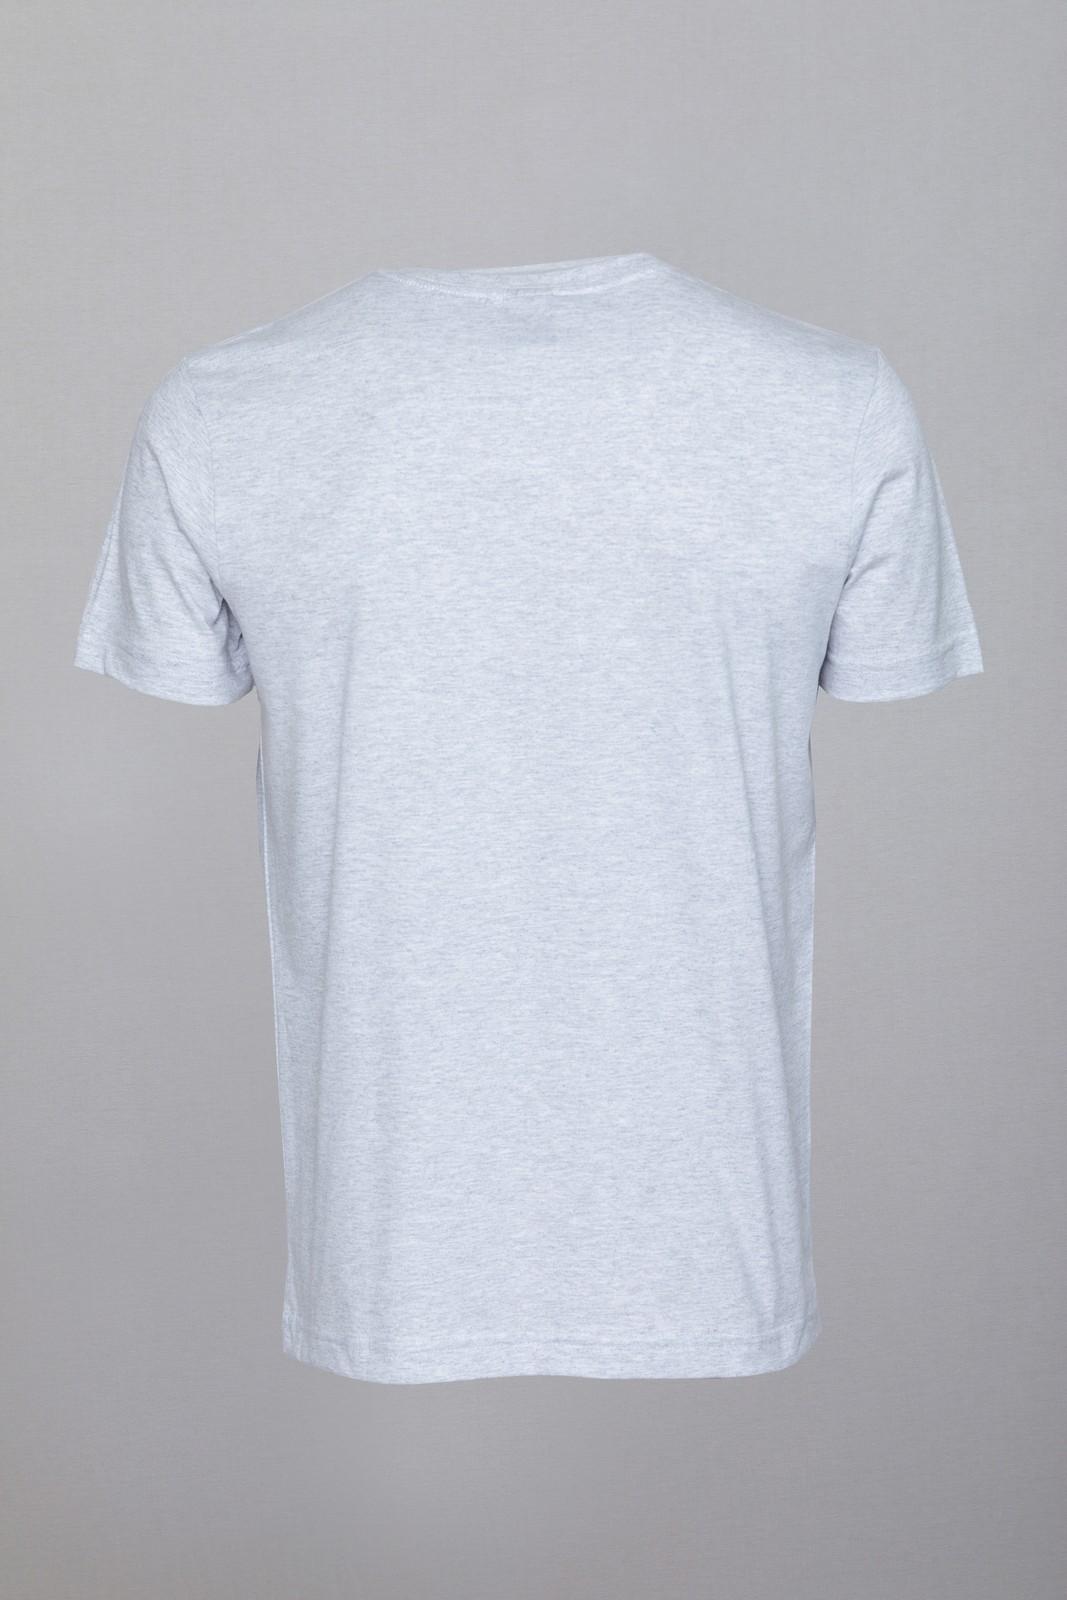 Camiseta CoolWave Principles Branca